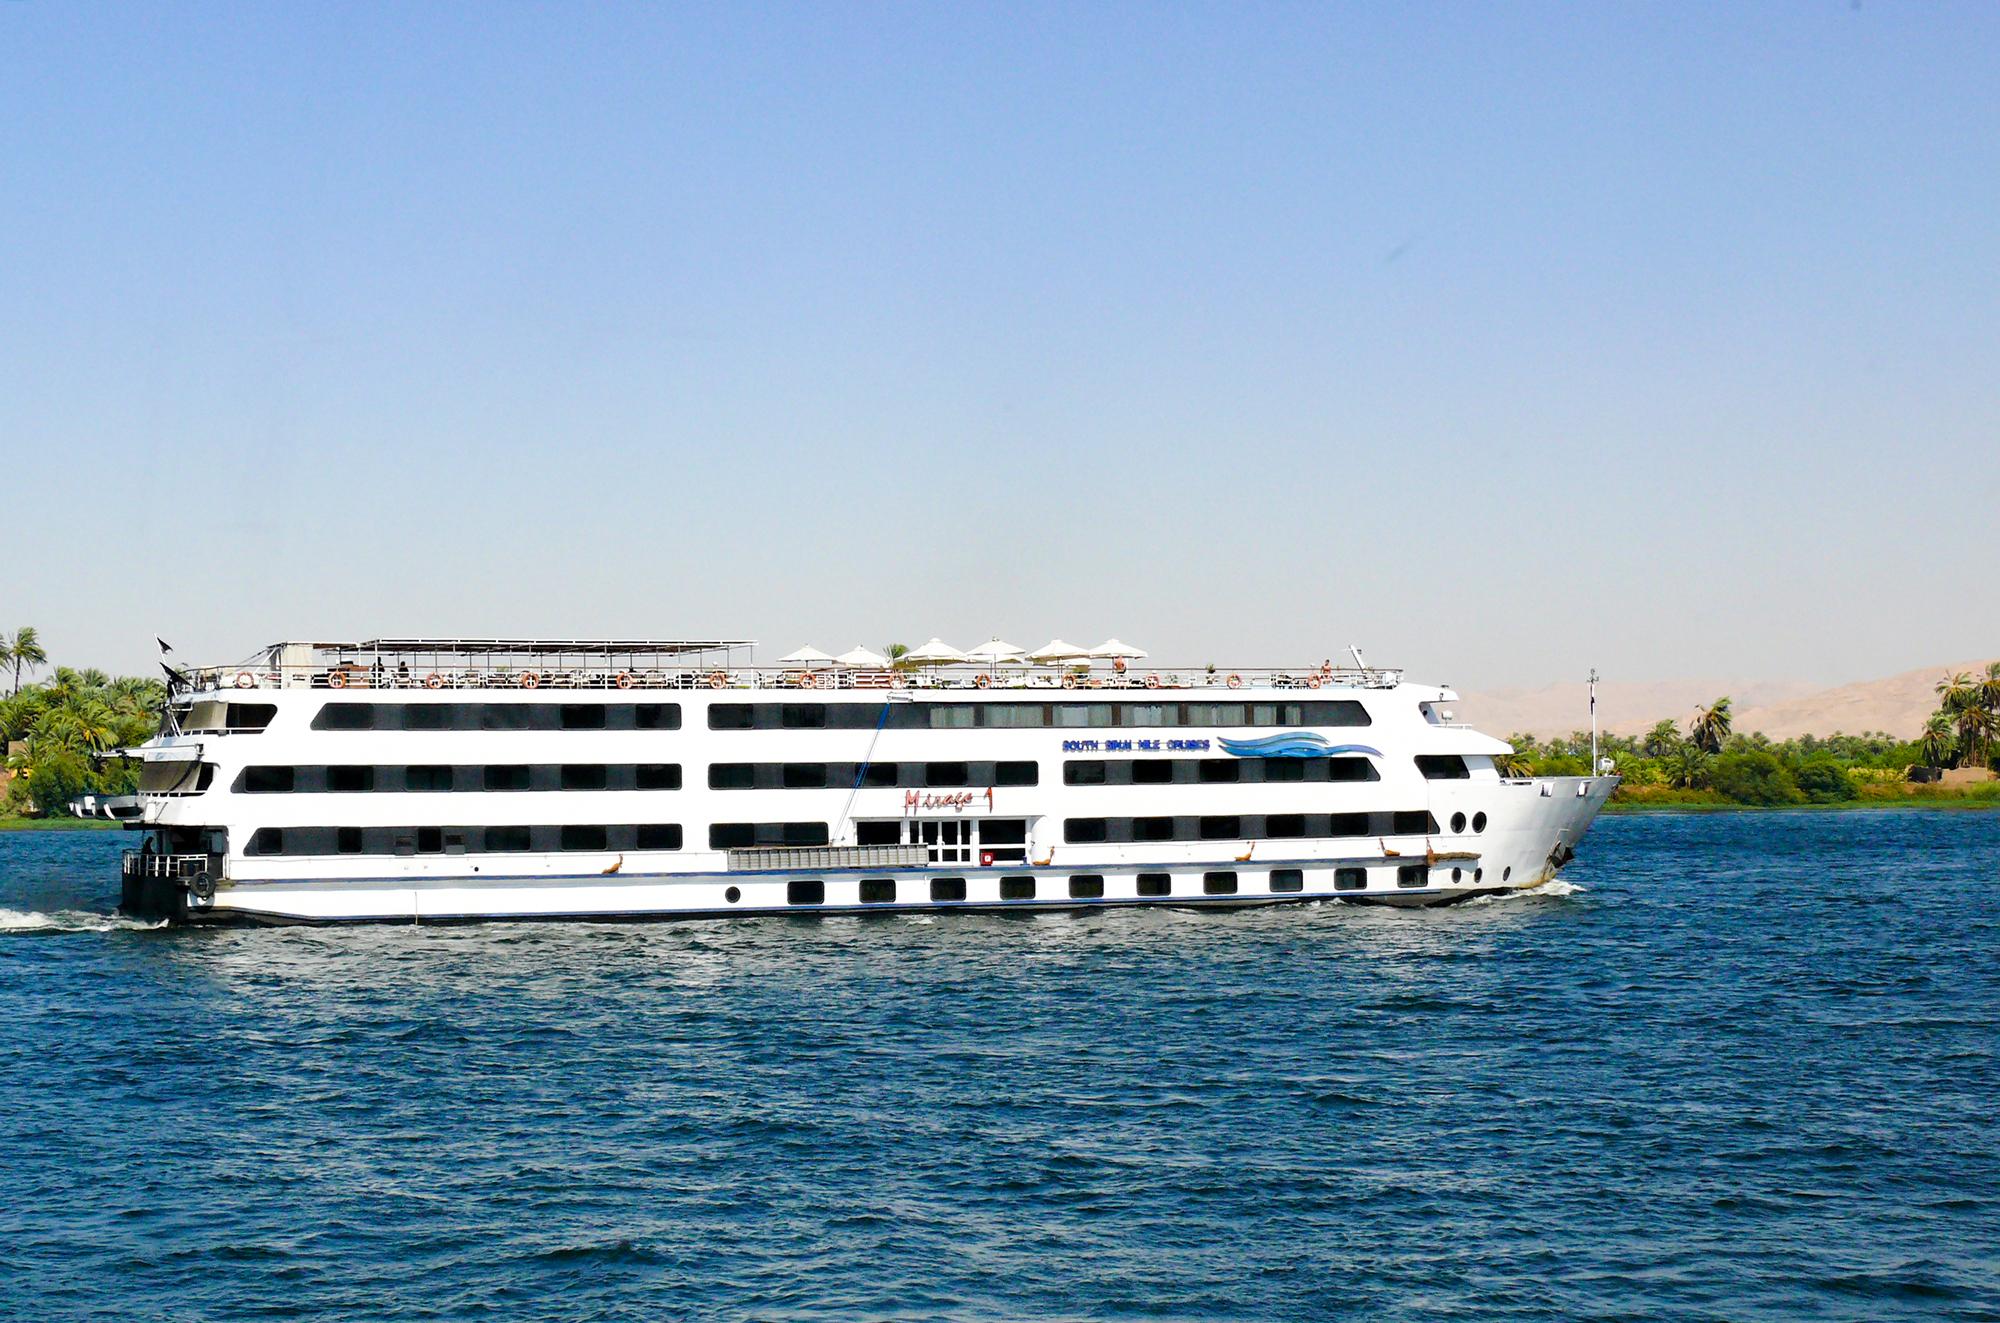 Nile River Boat, Egypt